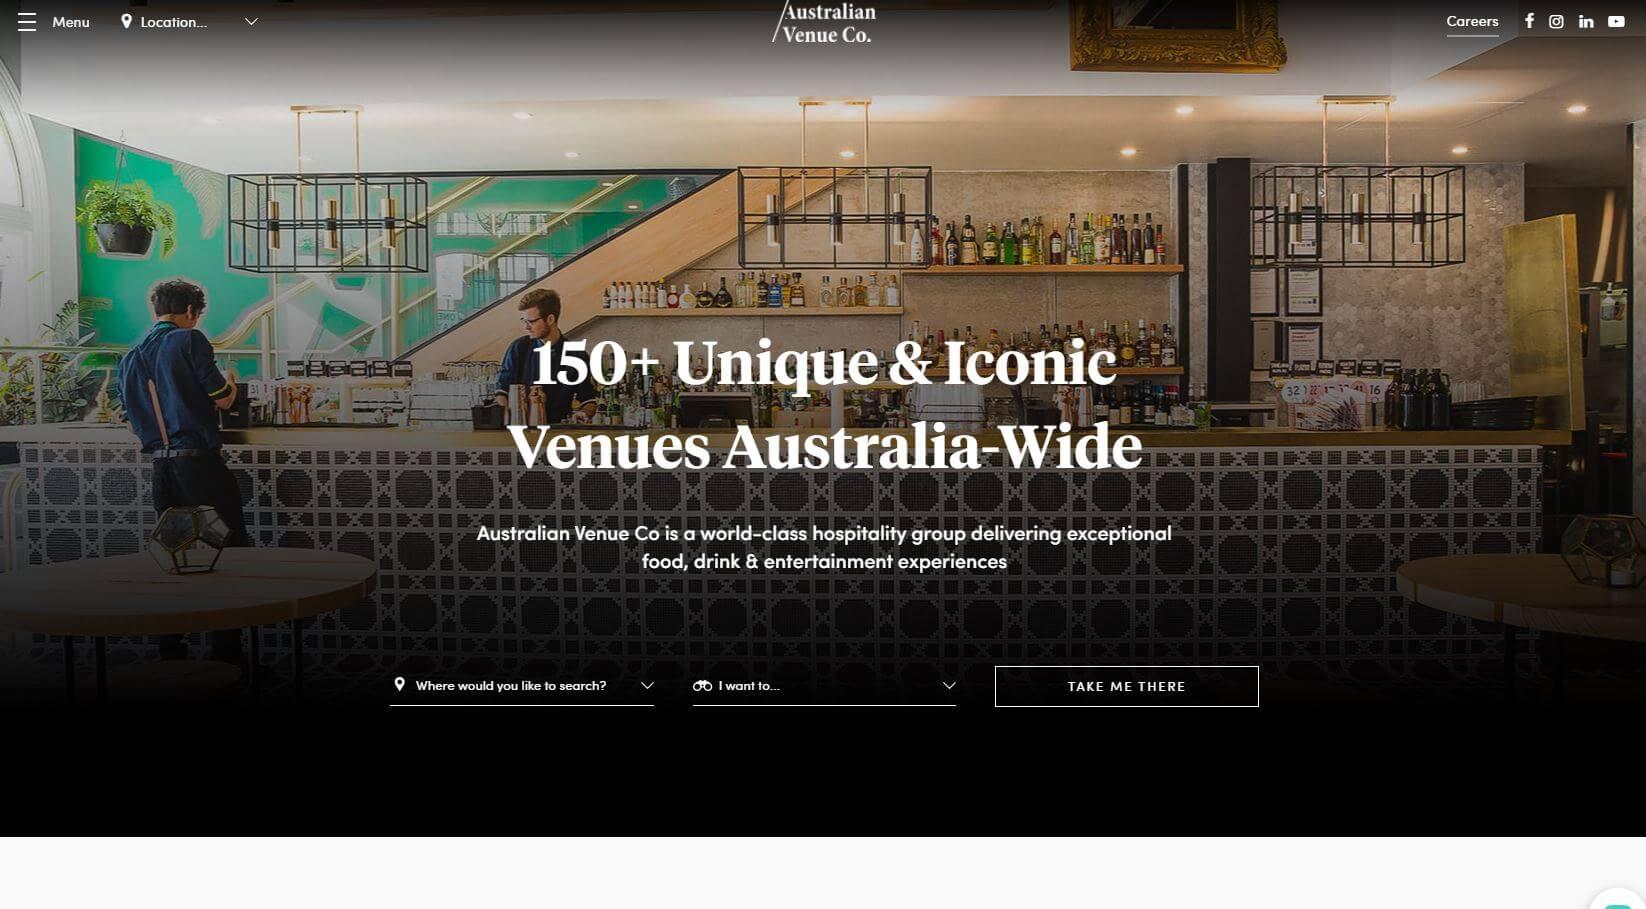 Australian Venue Co